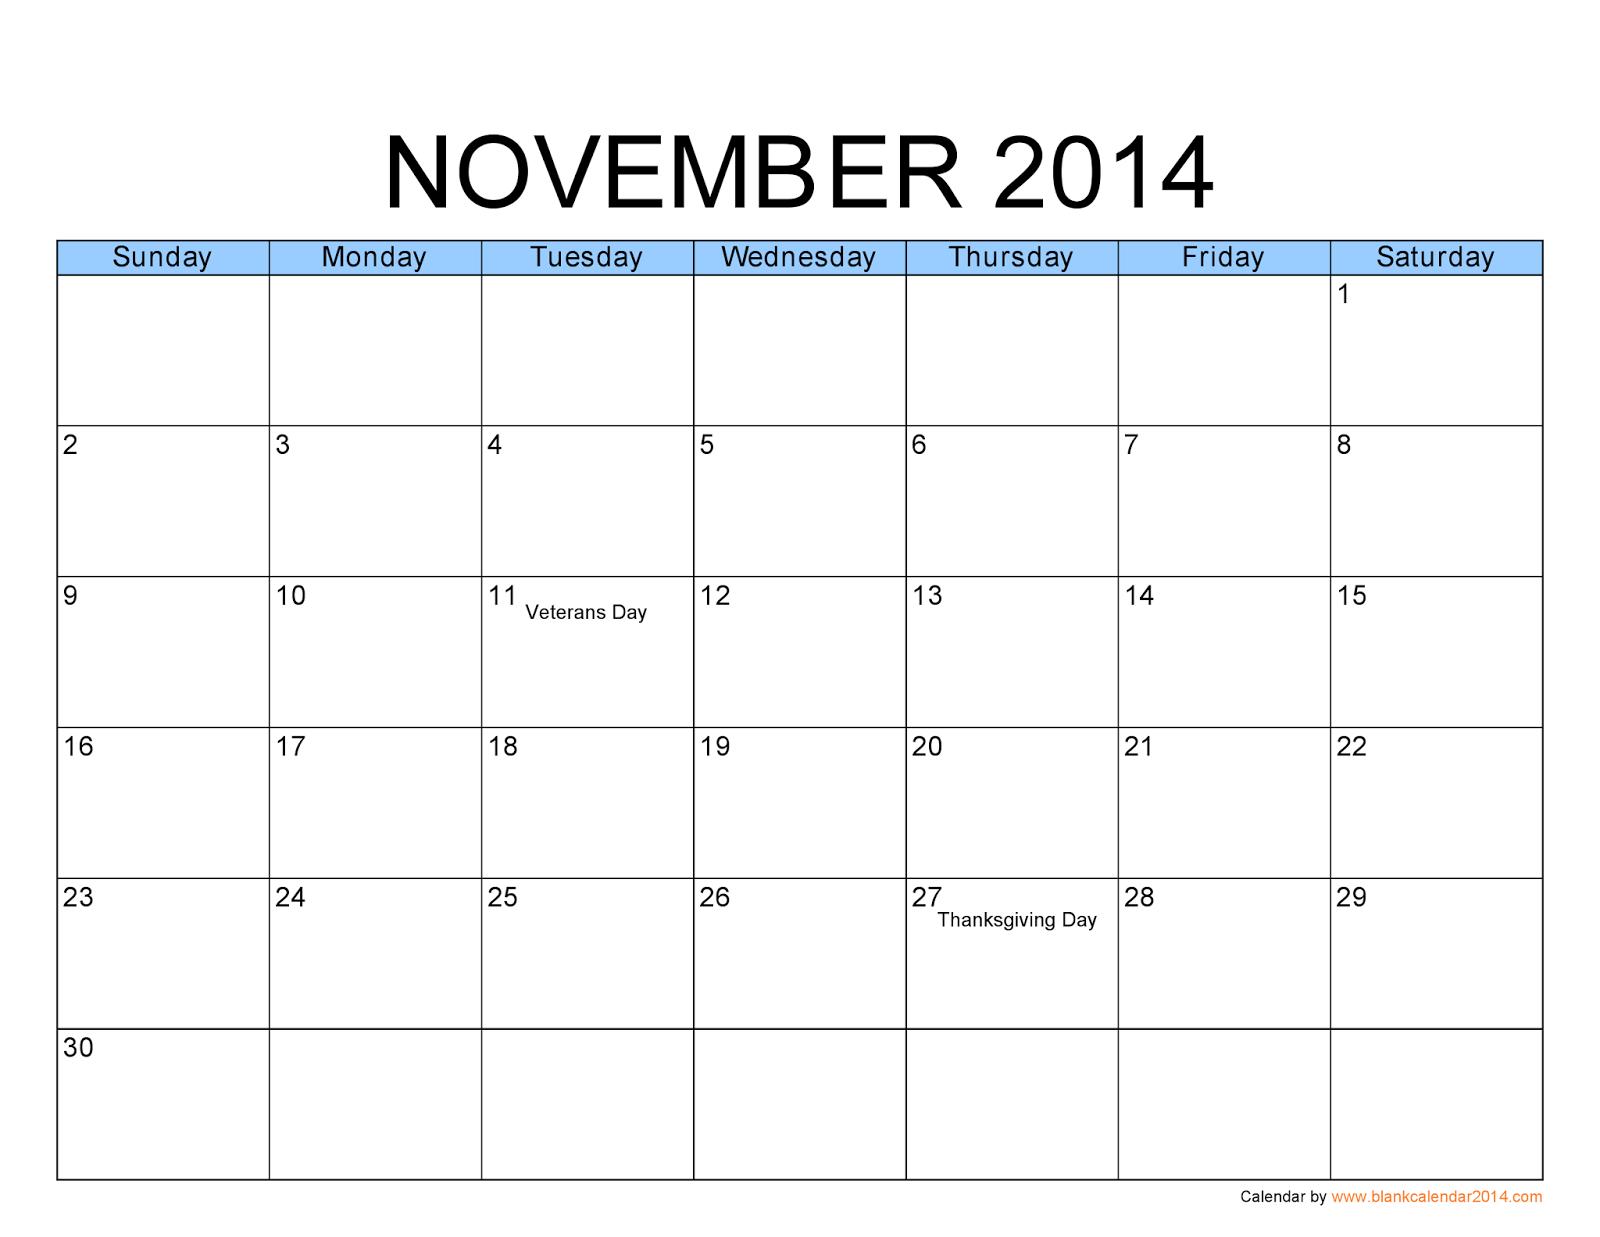 image November 2014 i dont remember the date lol